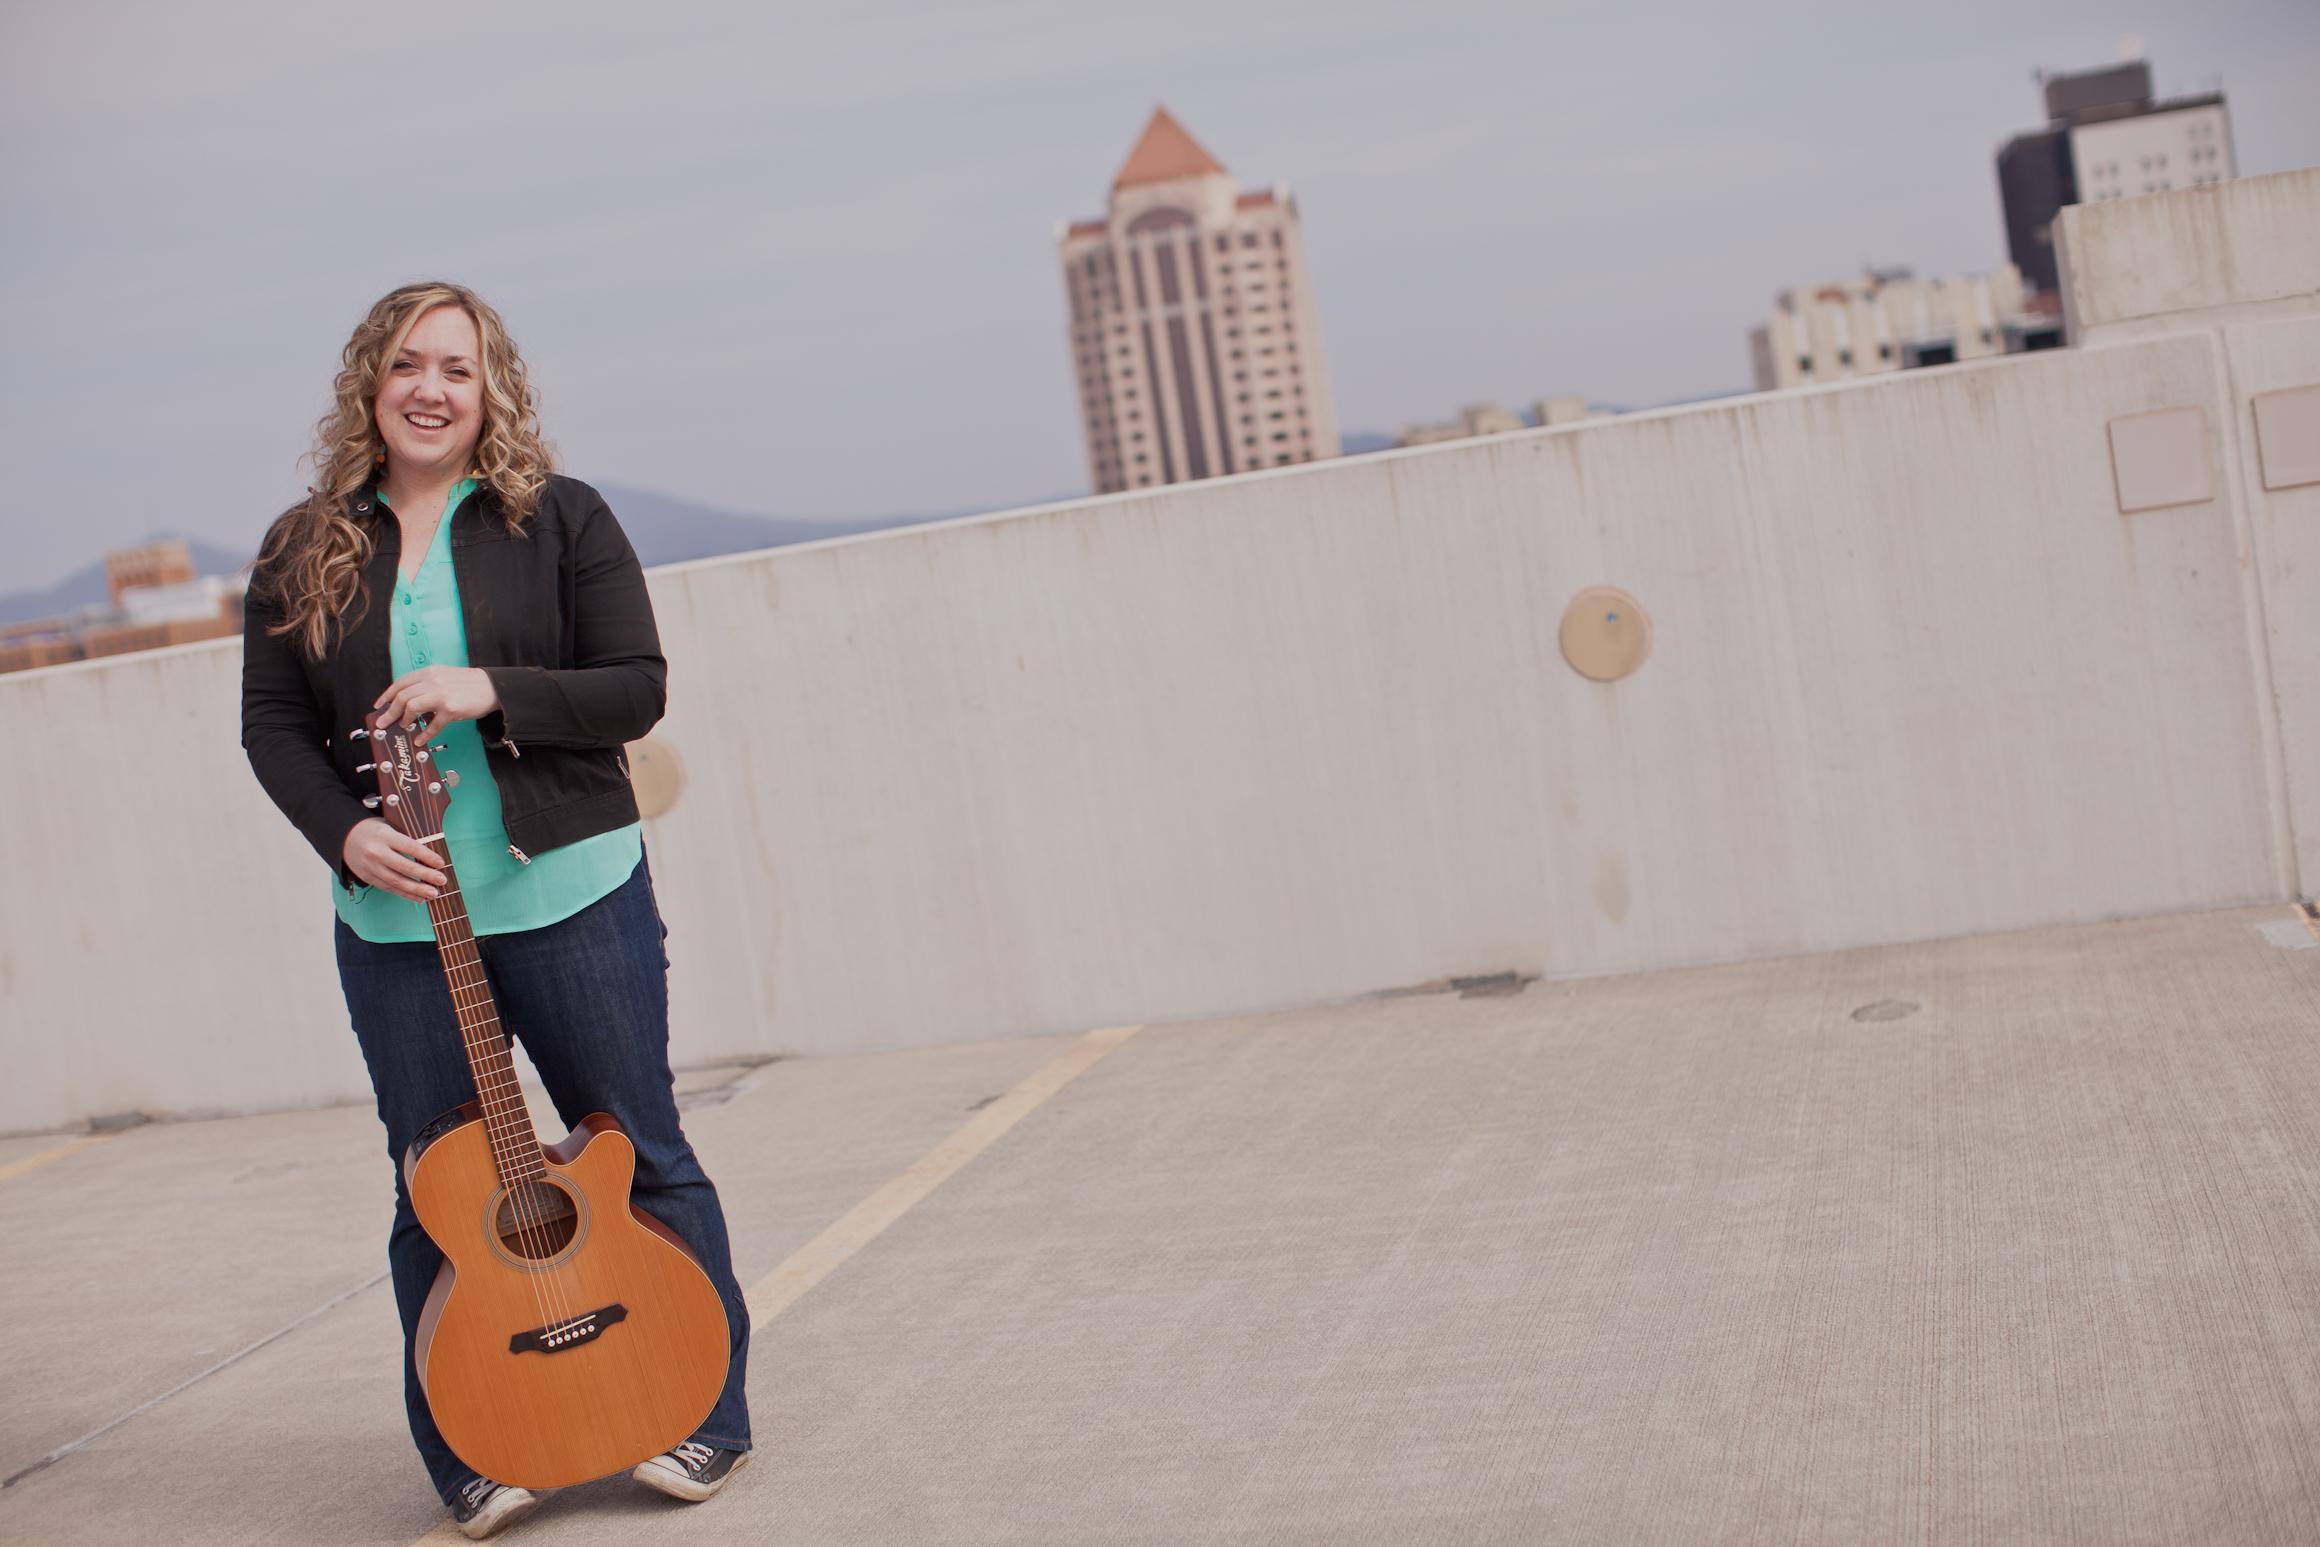 Amy Cox Photo Shoot Guitar Parking Garage Roanoke.jpg